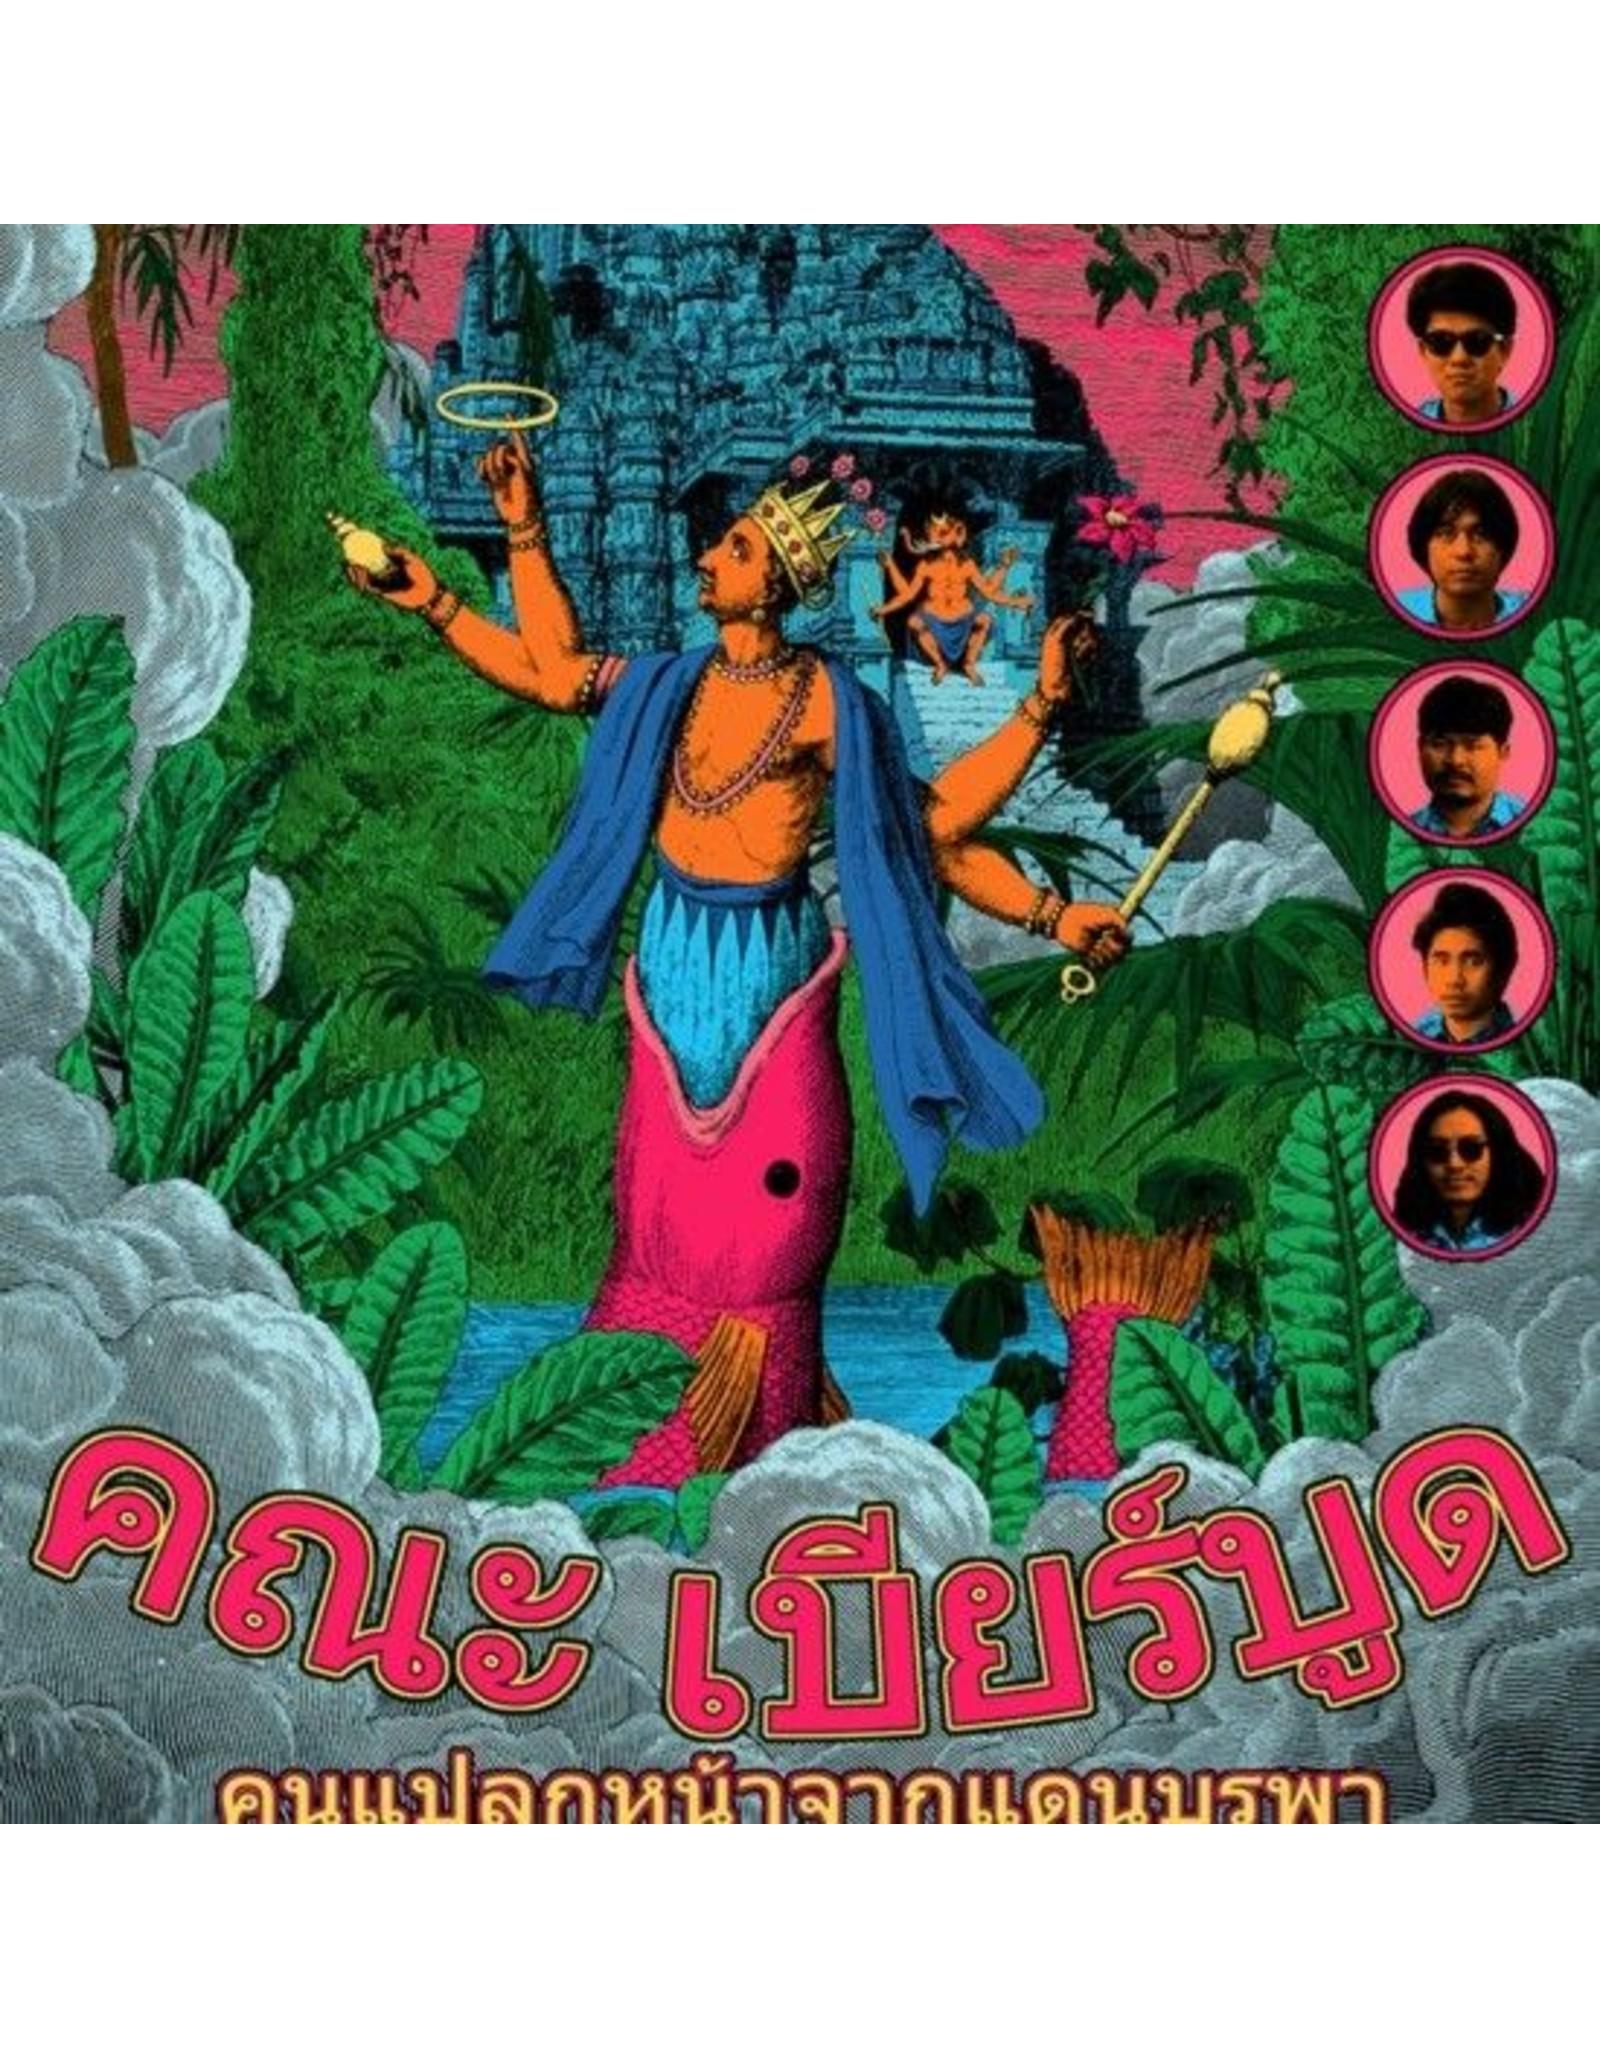 Guruguru Brain Khana Bierbood: Strangers from the Far East LP